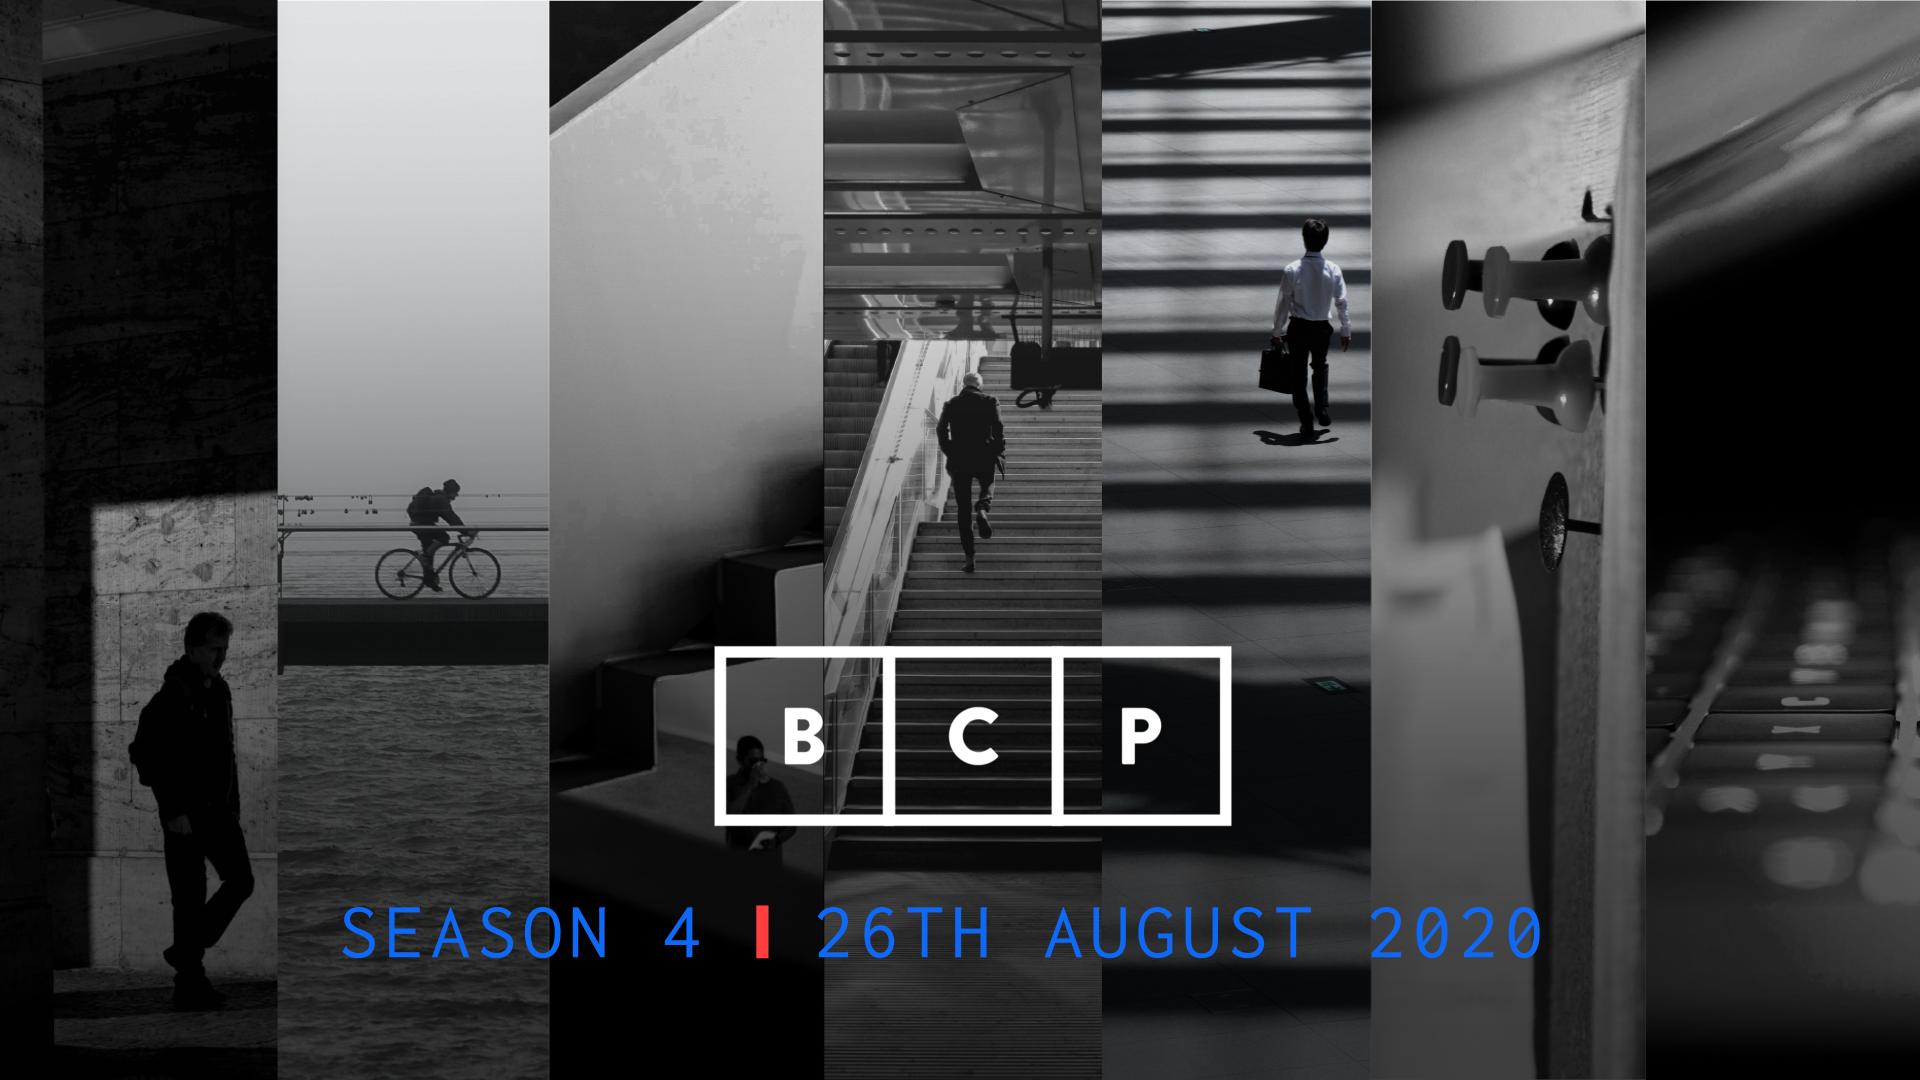 The BCPcast Season 4